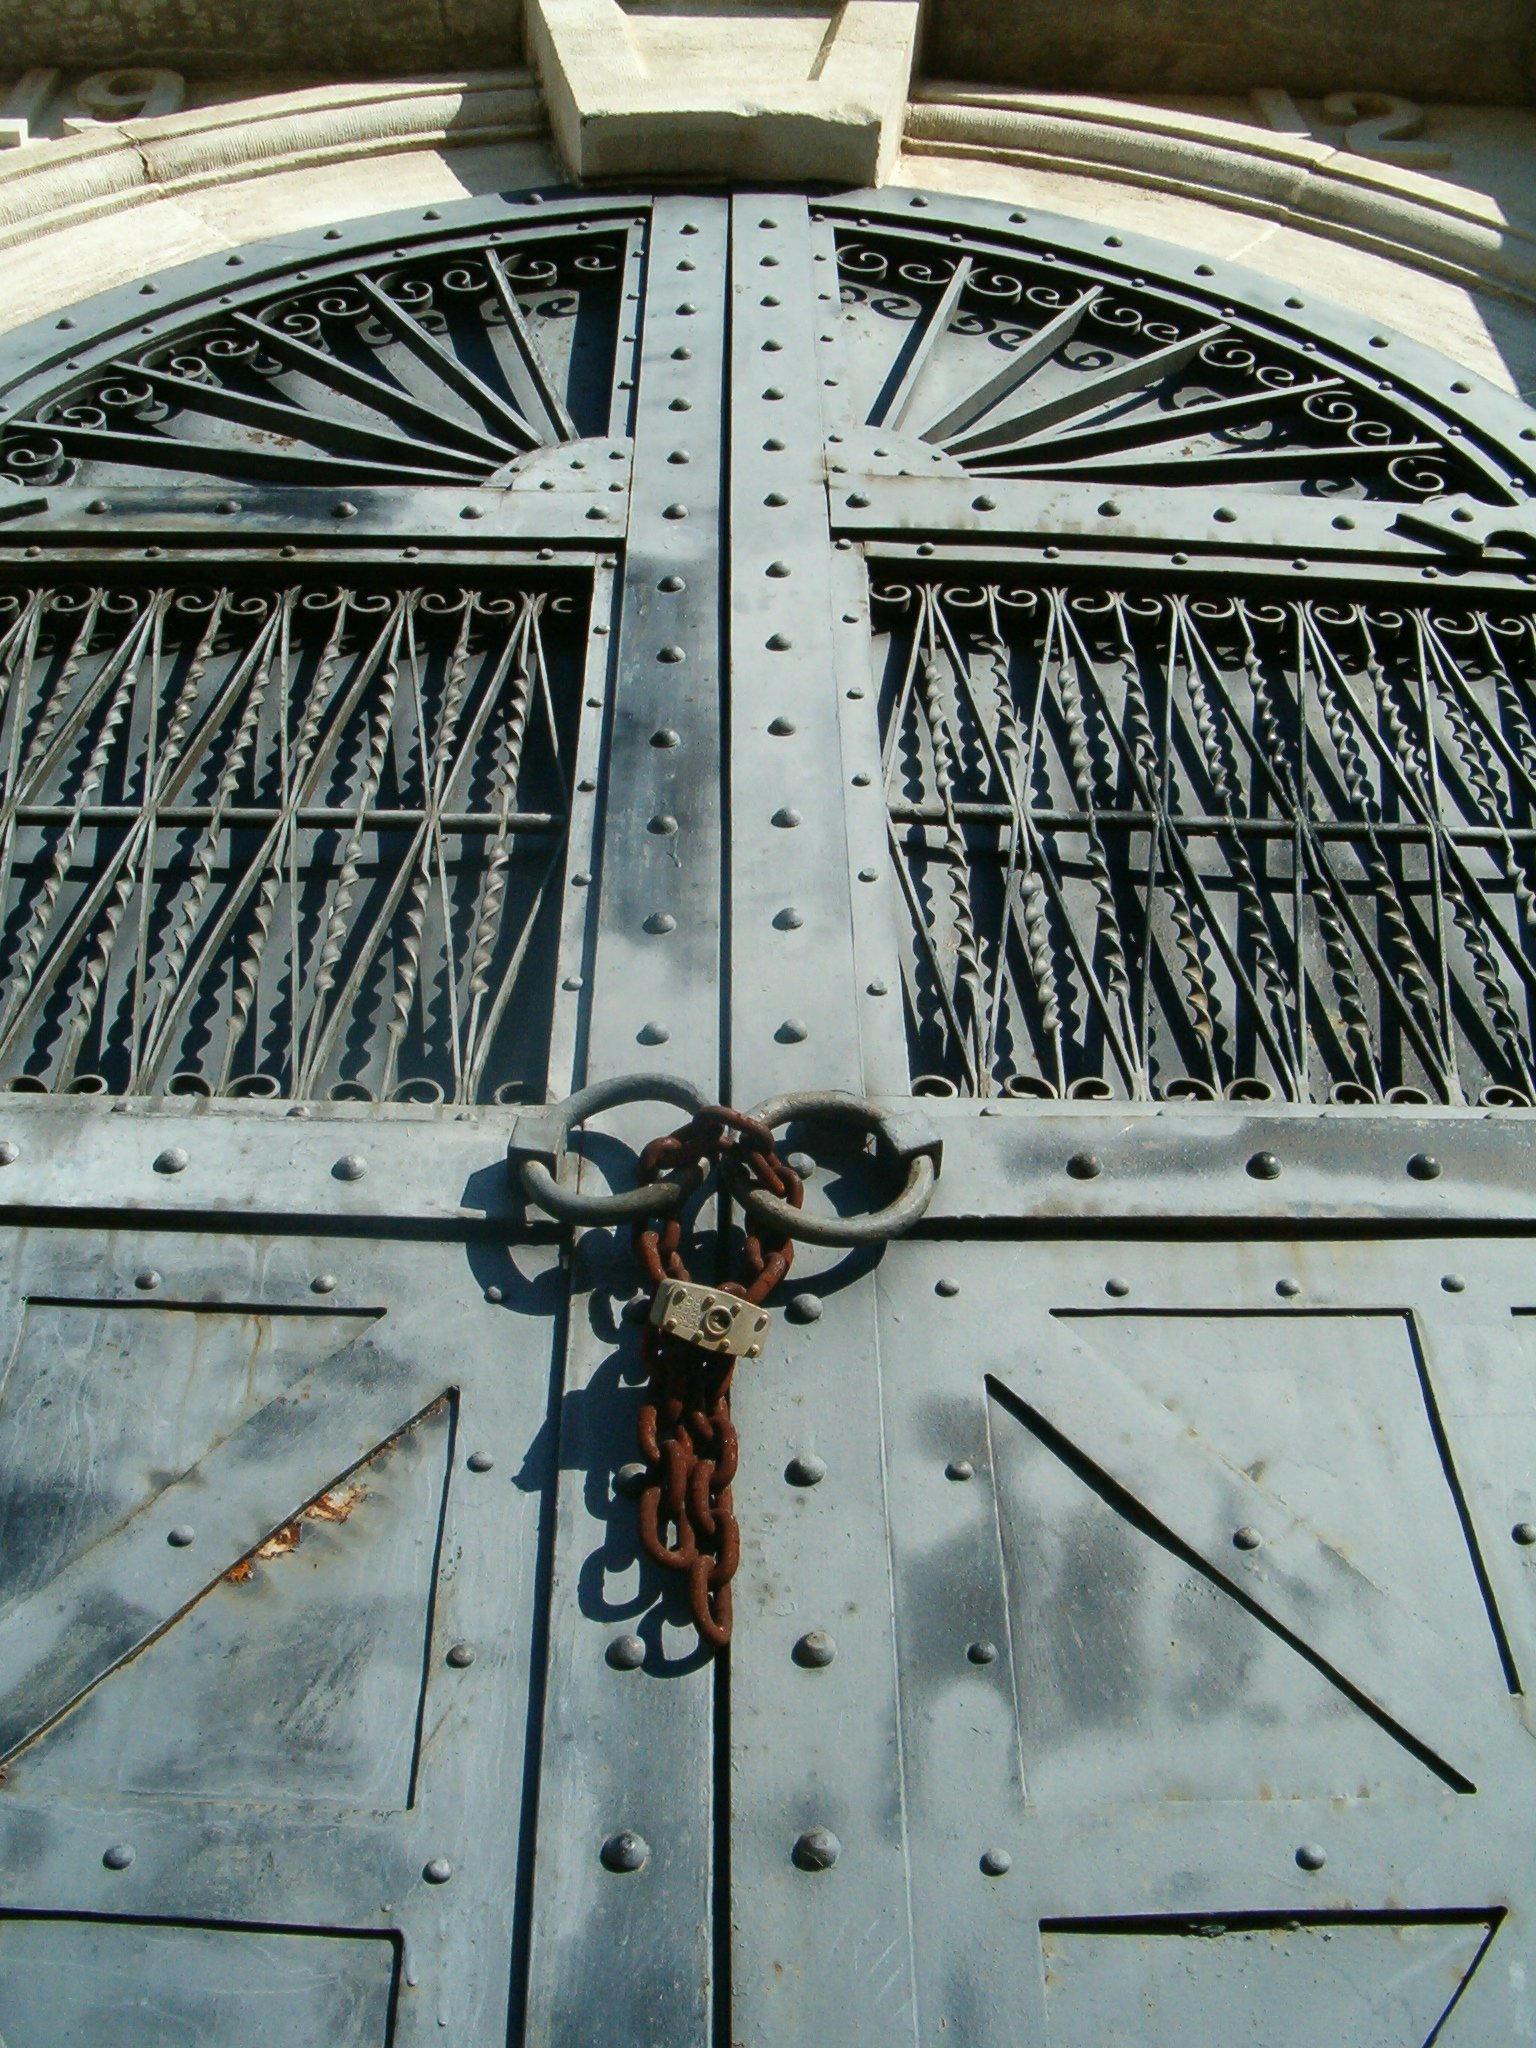 ... Mausoleum Doors 6 by Falln-Stock & Mausoleum Doors 6 by Falln-Stock on DeviantArt Pezcame.Com